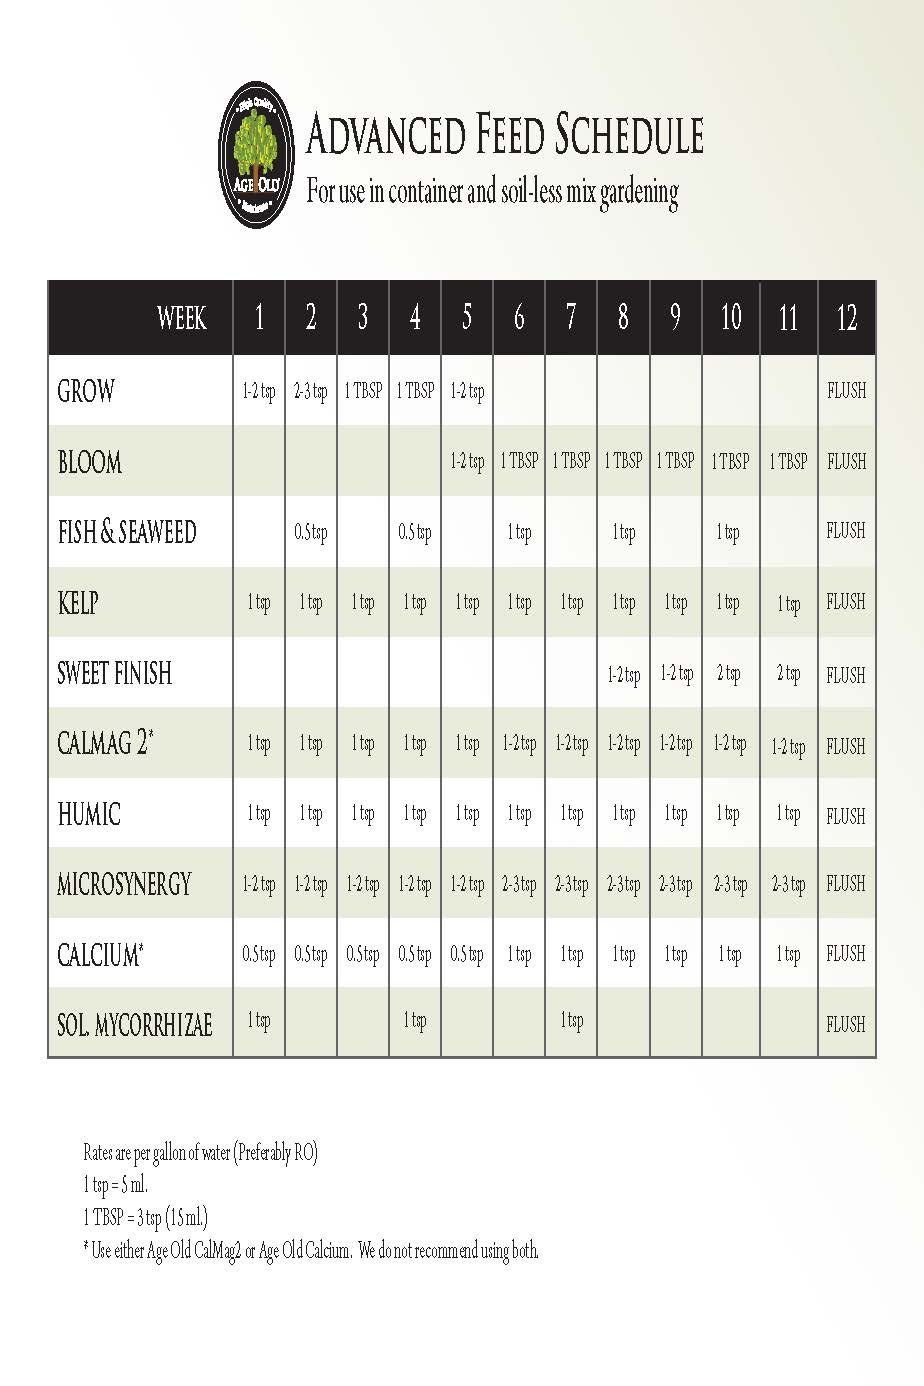 Advanced Nutrients Feeding Chart : advanced, nutrients, feeding, chart, Advanced, Nutrients, Feeding, Chart, Gallery